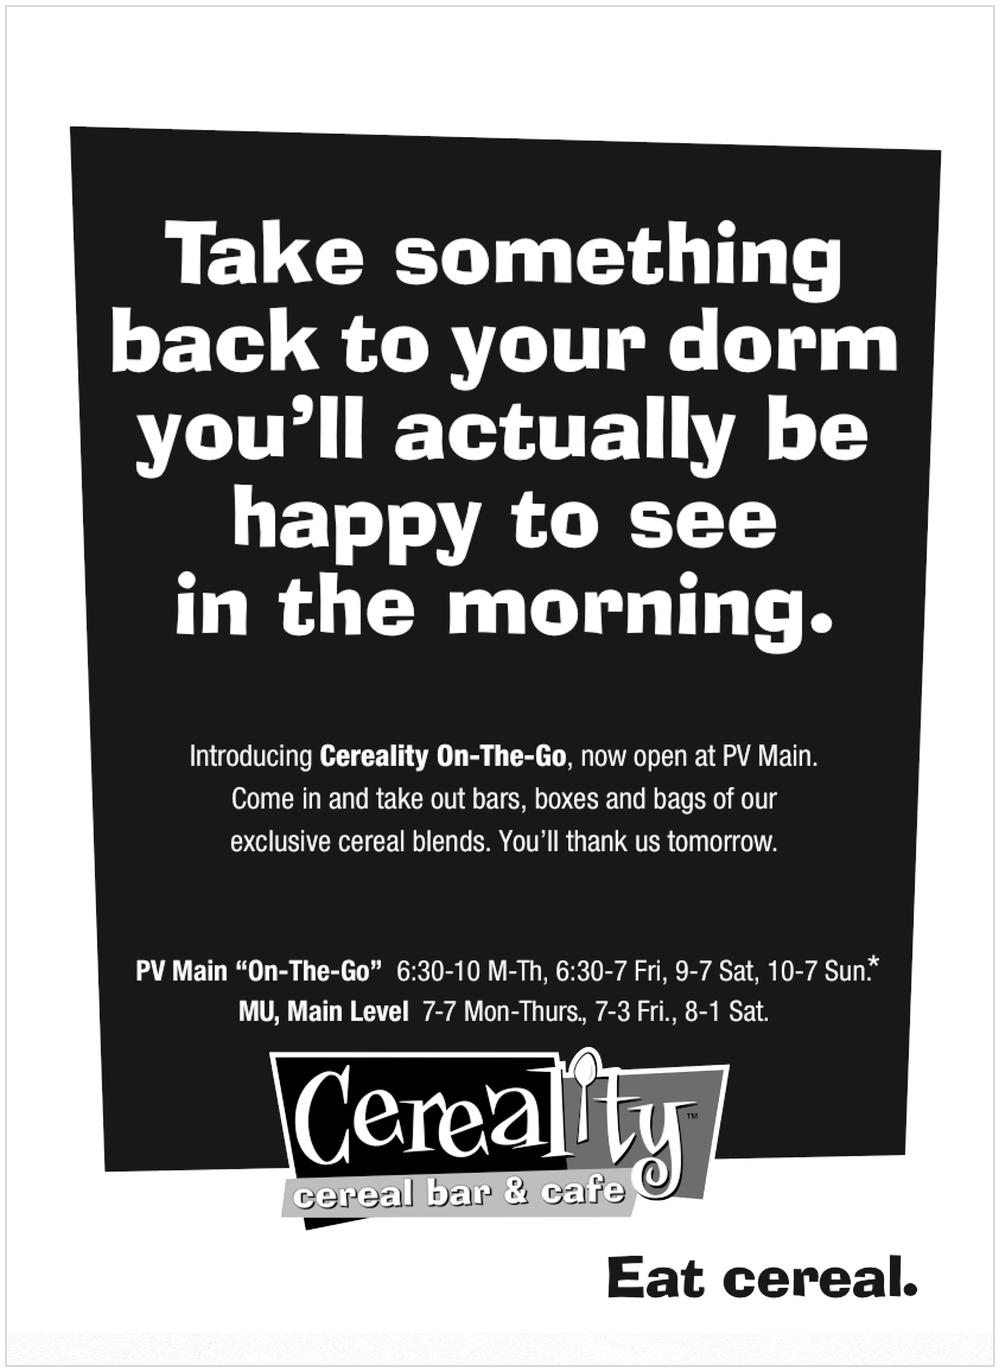 CerealityTakeBack.jpg